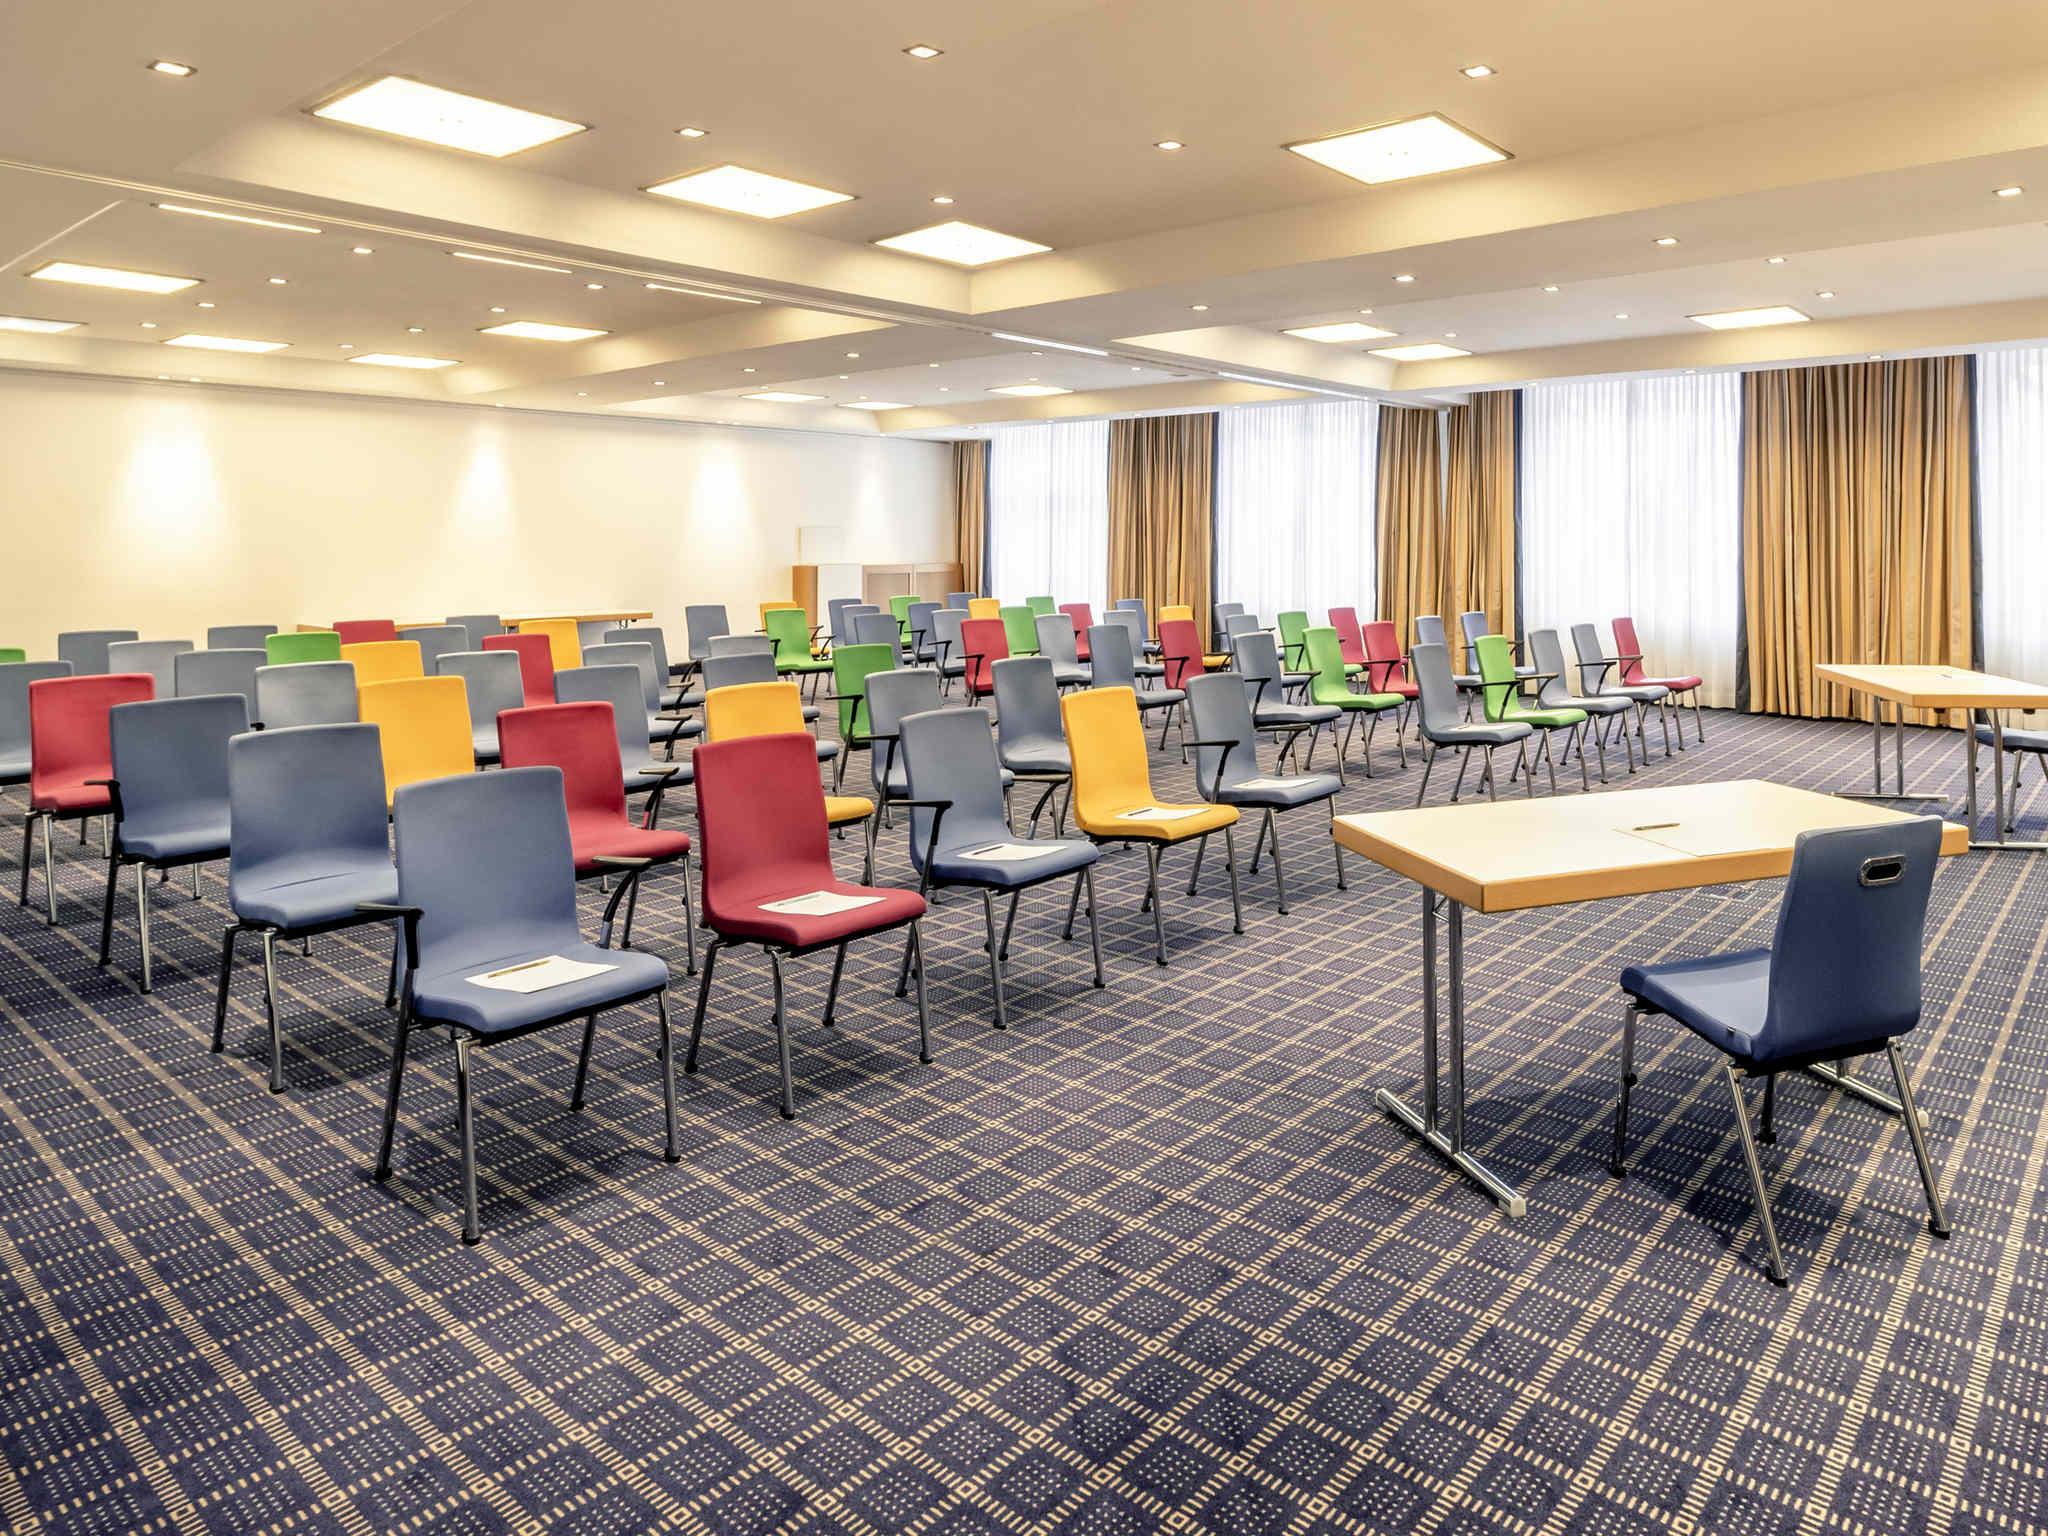 Meetings And Events Mercure Hotel Koeln City Friesenstre